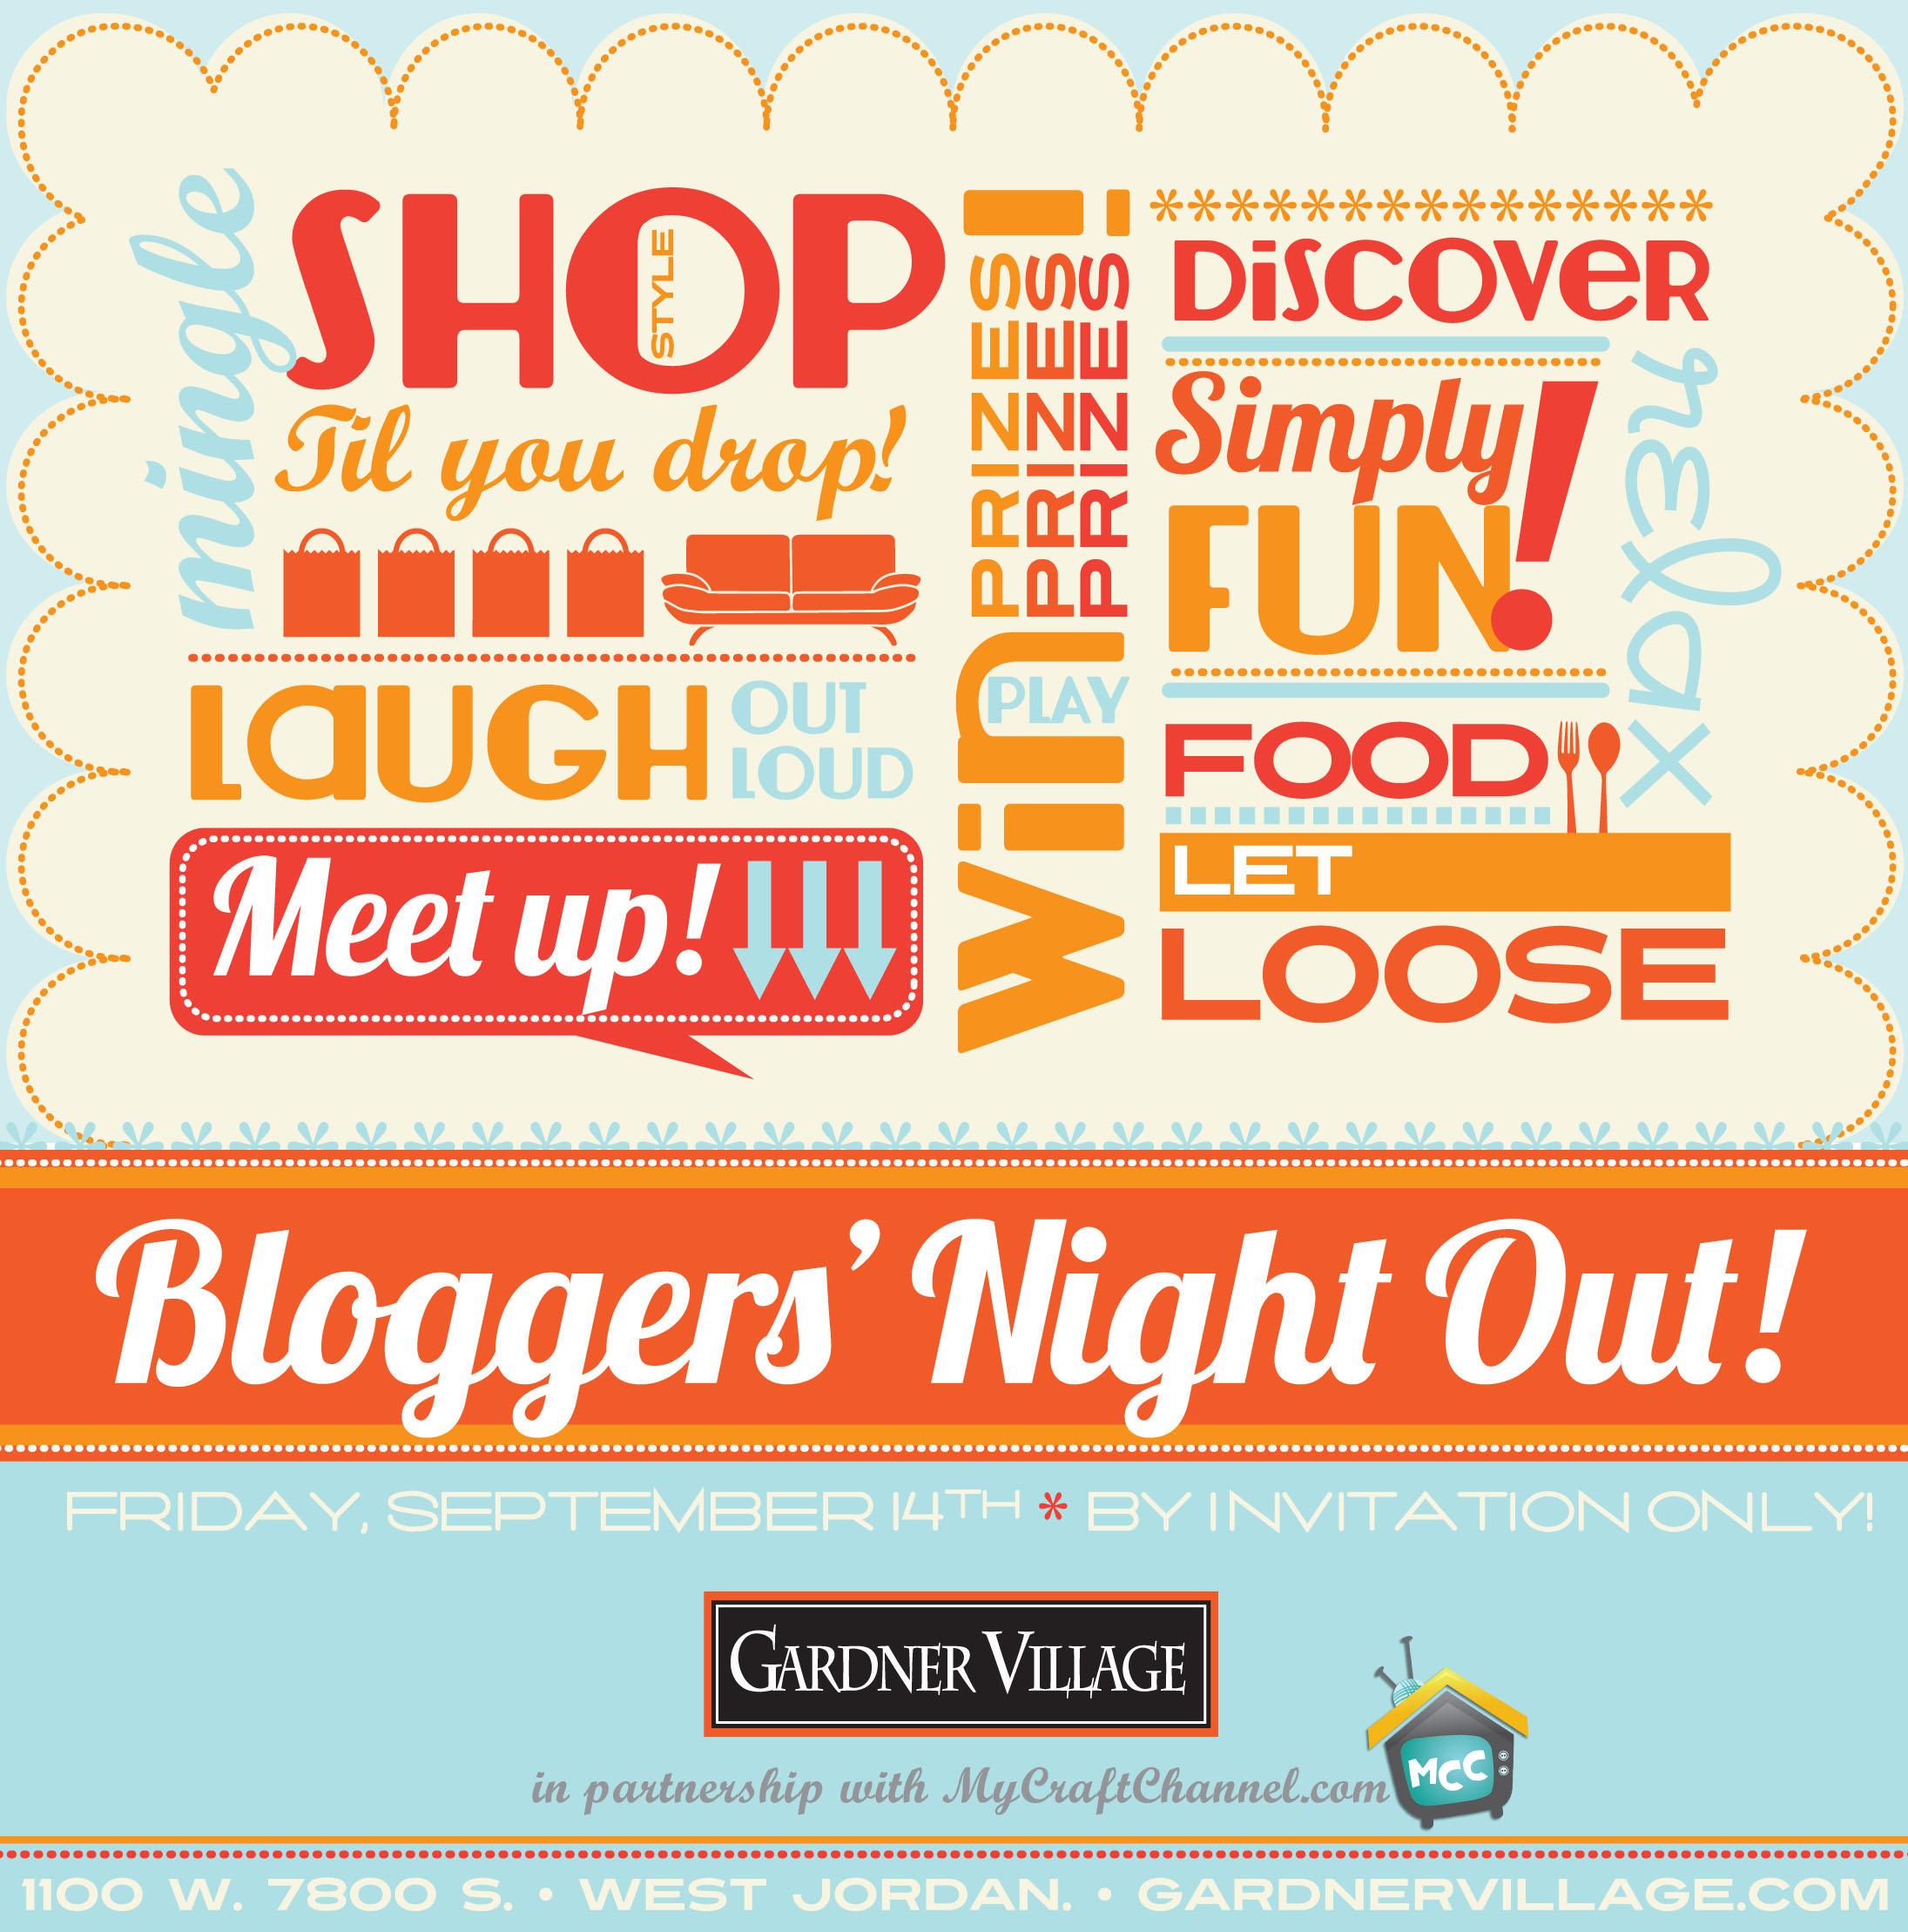 GV_MCC Blogger Night Out Logo